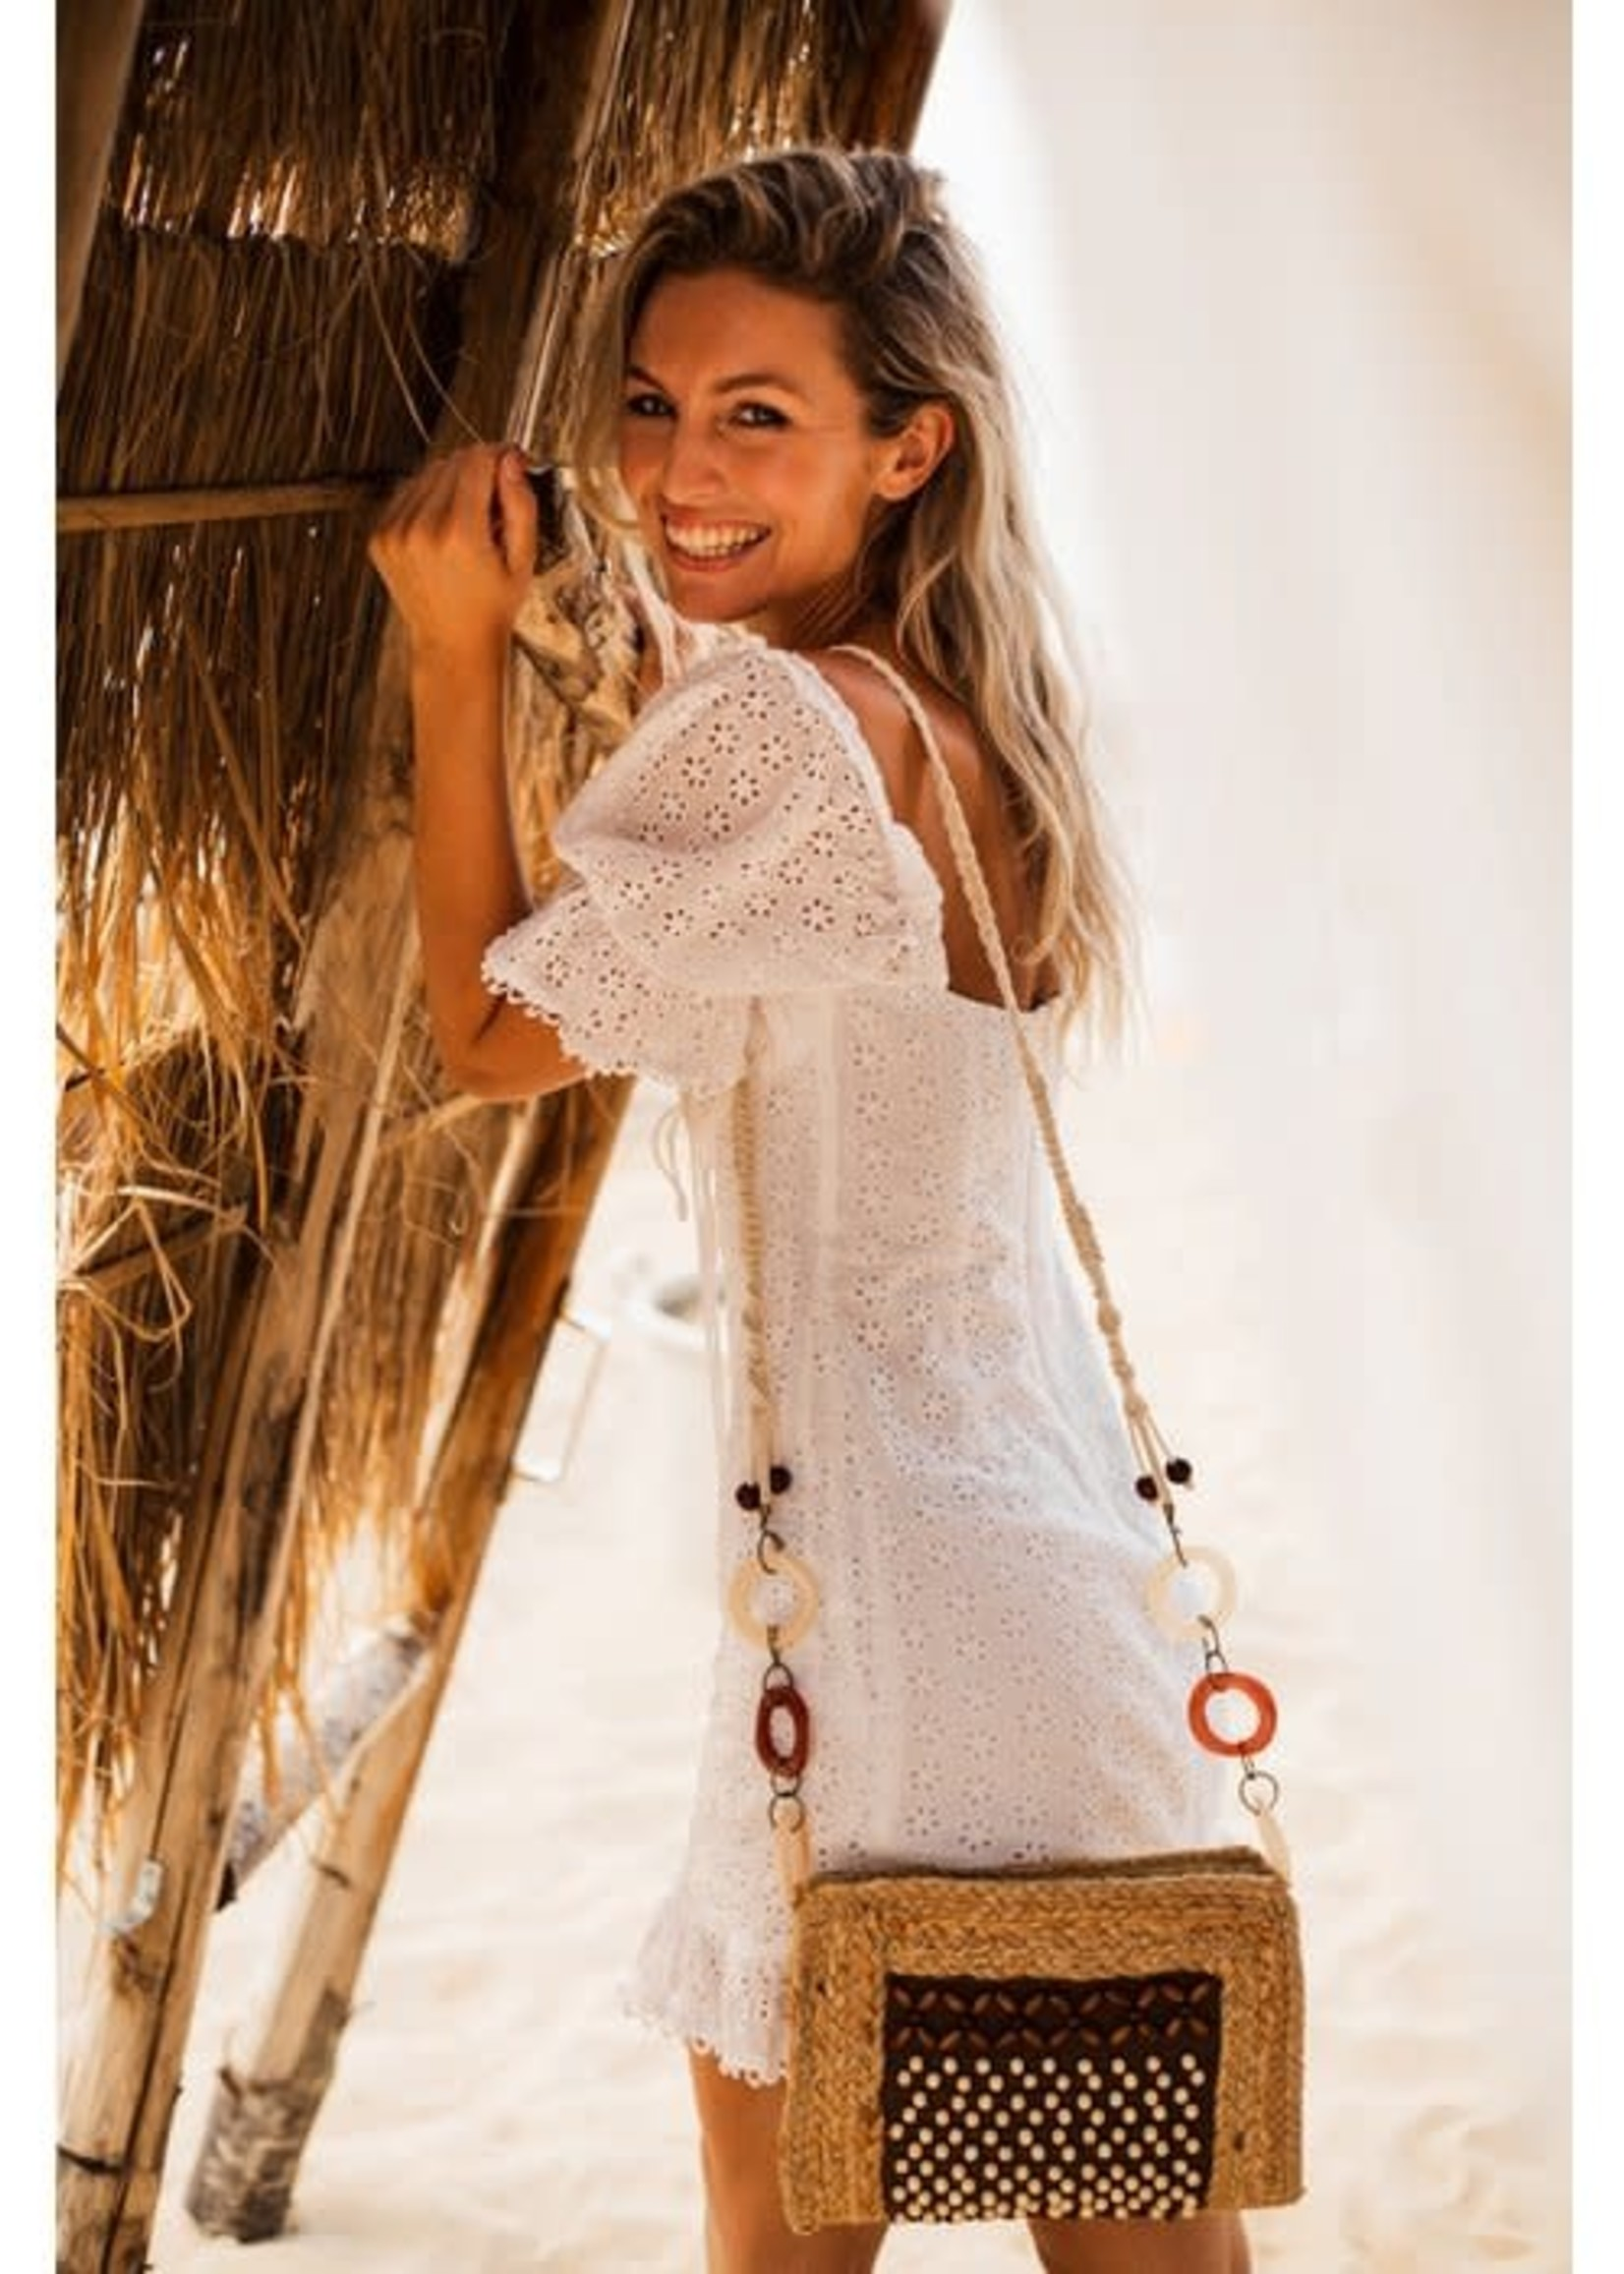 Mycha Ibiza Mycha - Ibiza - rechthoekige tas Cala Jondal